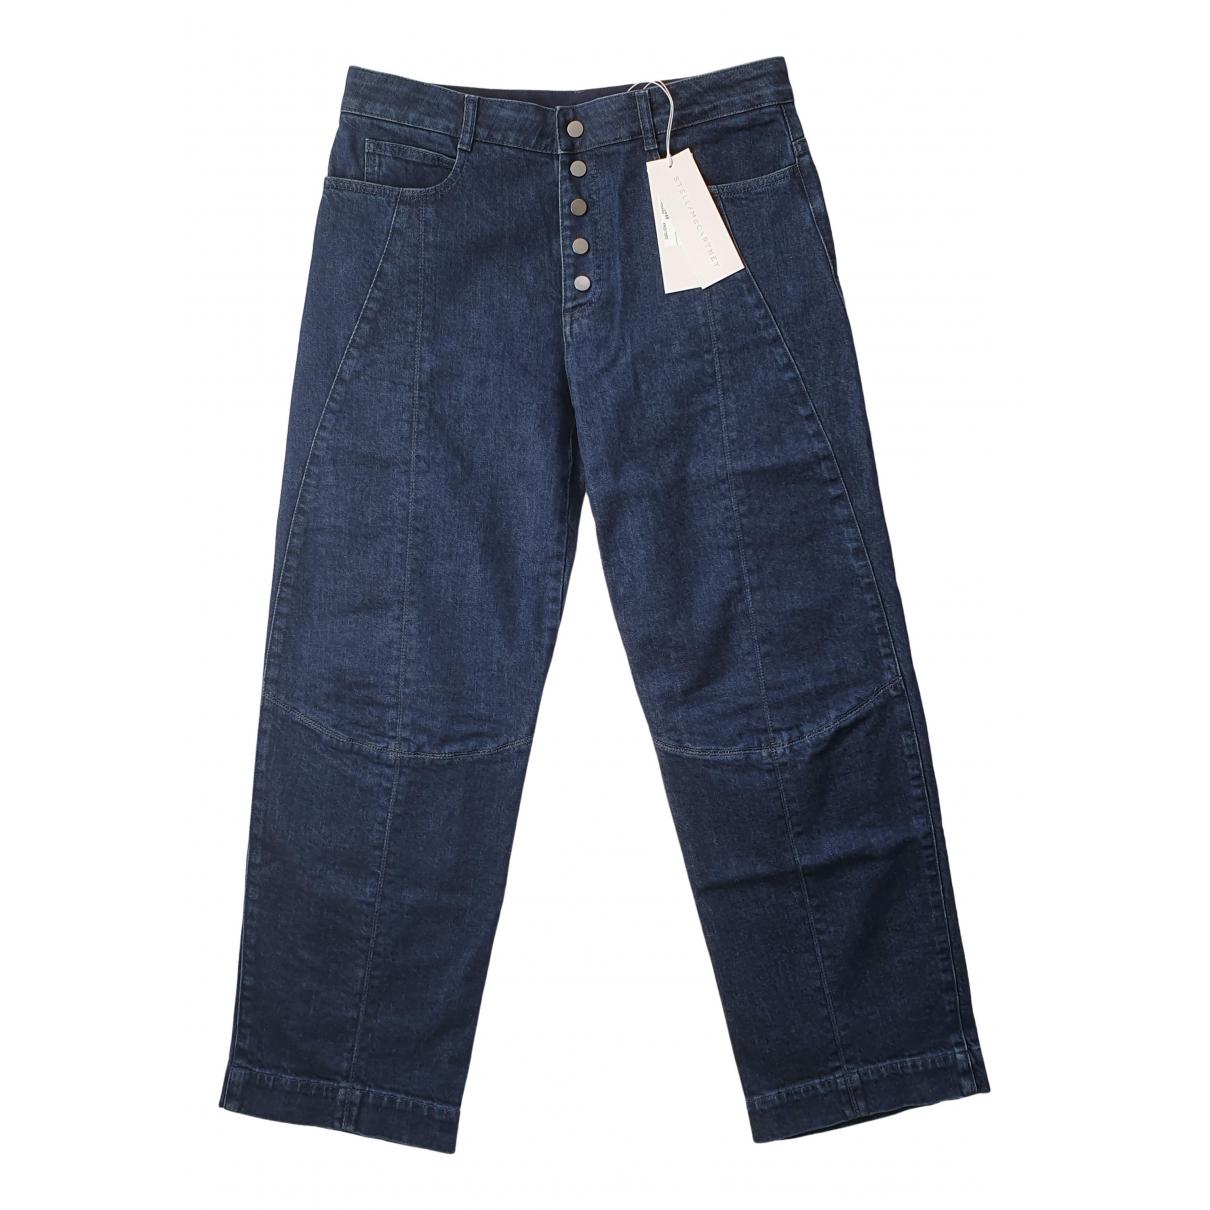 Stella Mccartney \N Blue Cotton - elasthane Jeans for Women 31 US